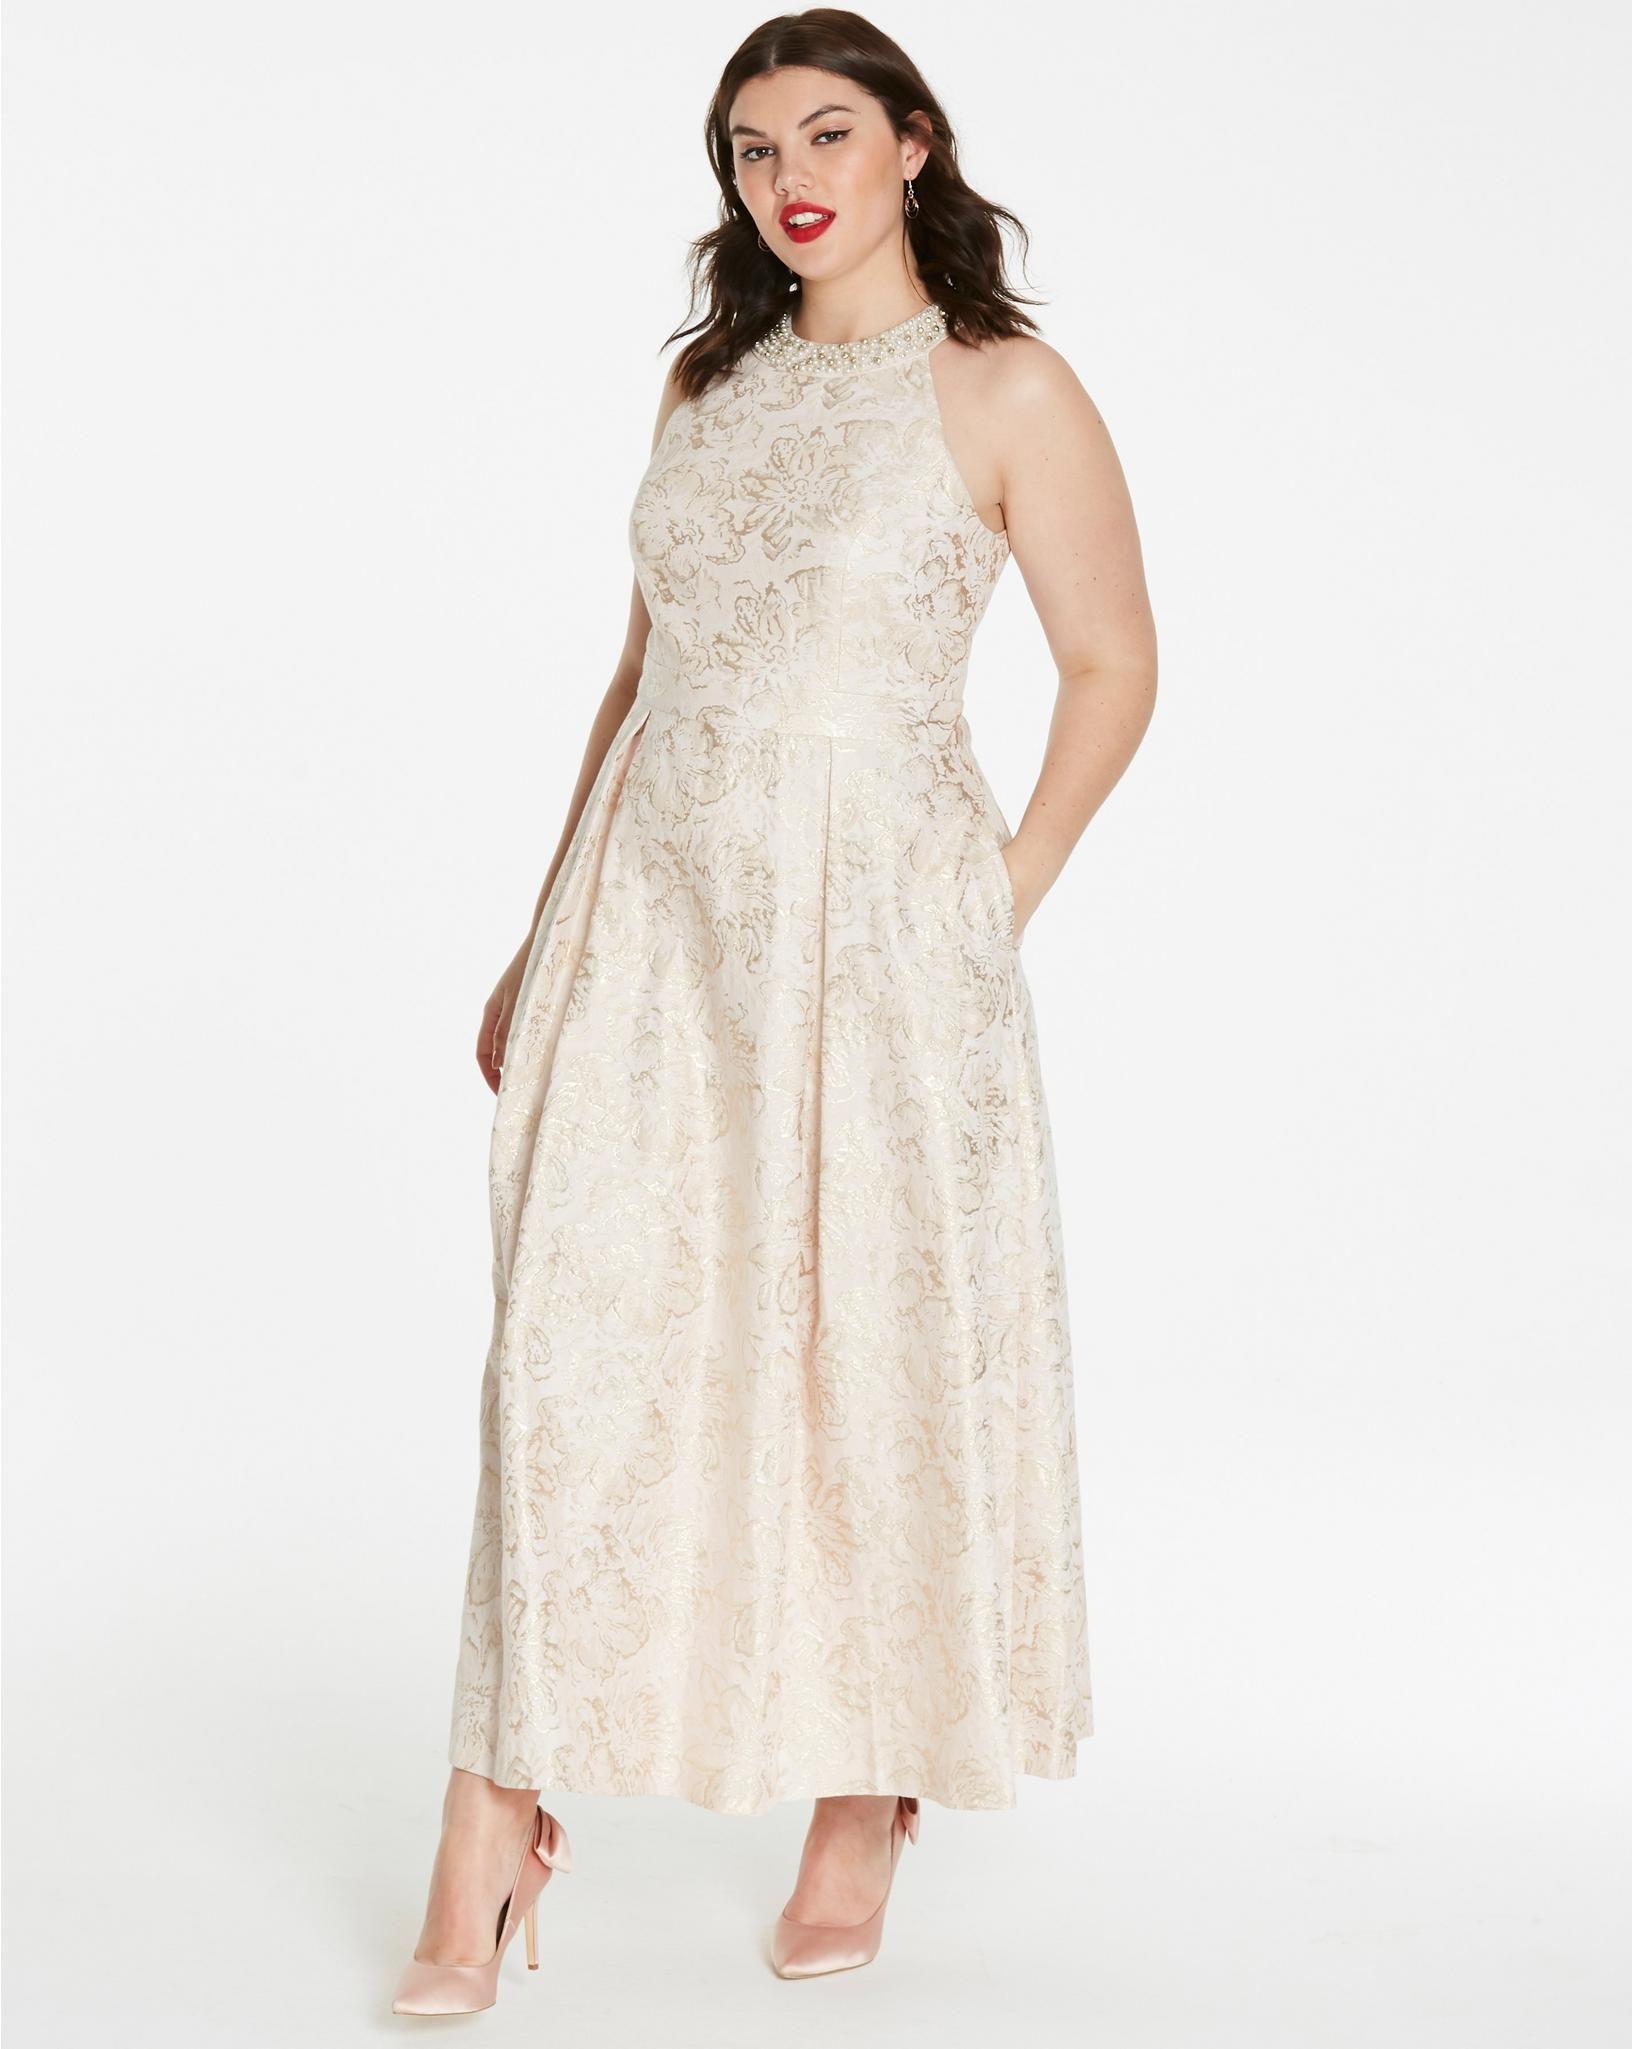 Joanna Hope Jacquard Ballerina Dress | Simply Be USA ...